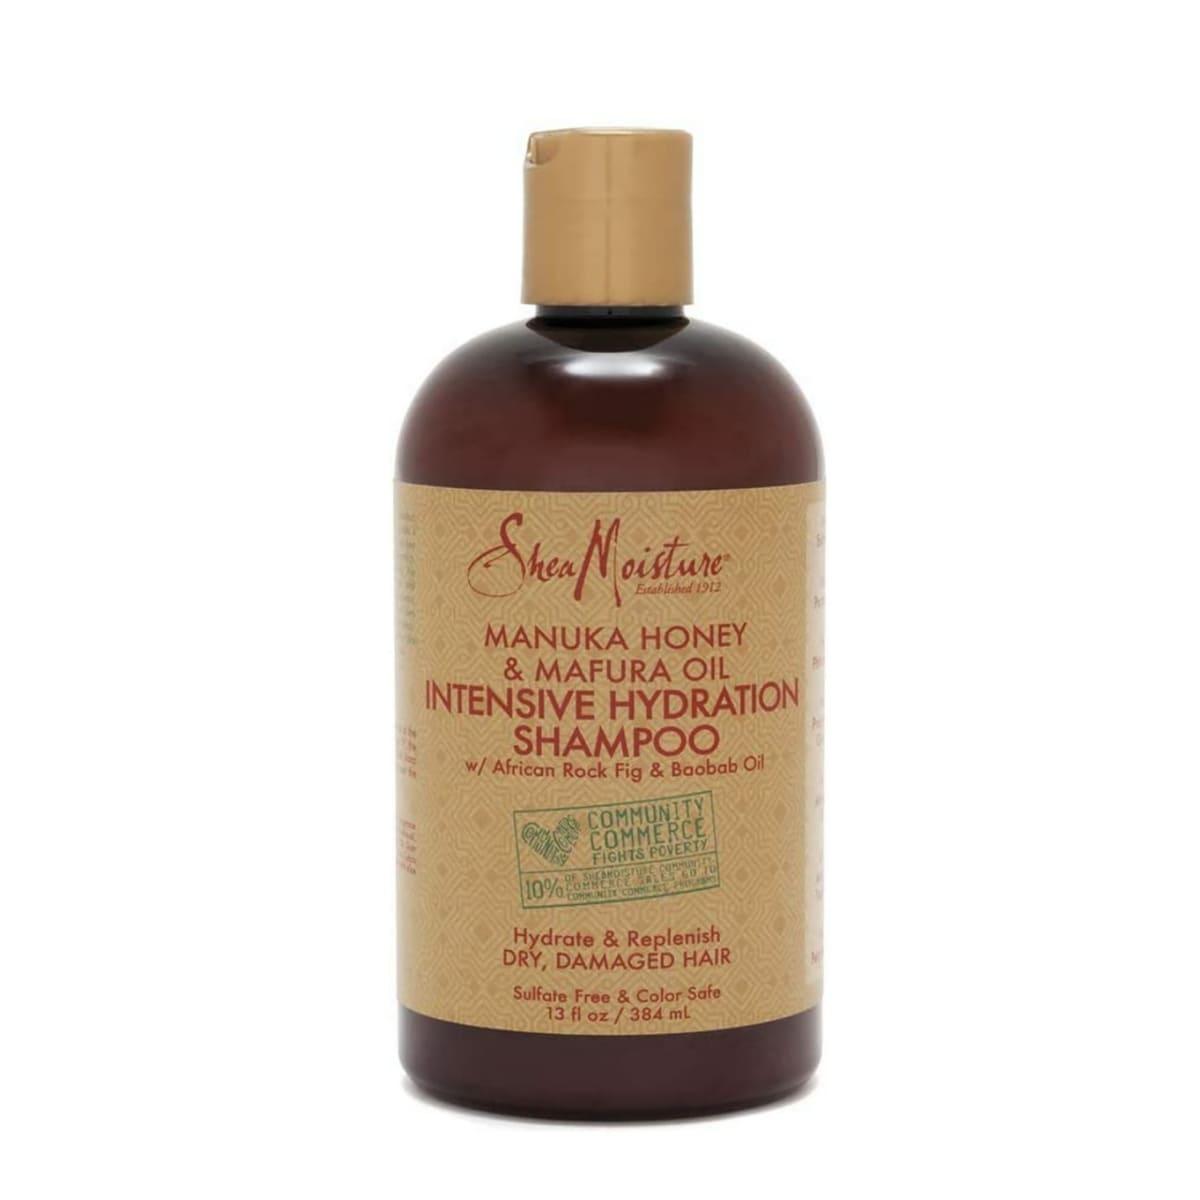 comprar-cosmetico-vegano-champu-manuka-honey-&-mafura-oil-sheamoisture-metodo-curly-trenzas-crochet-pelucas-www.muerebella.com